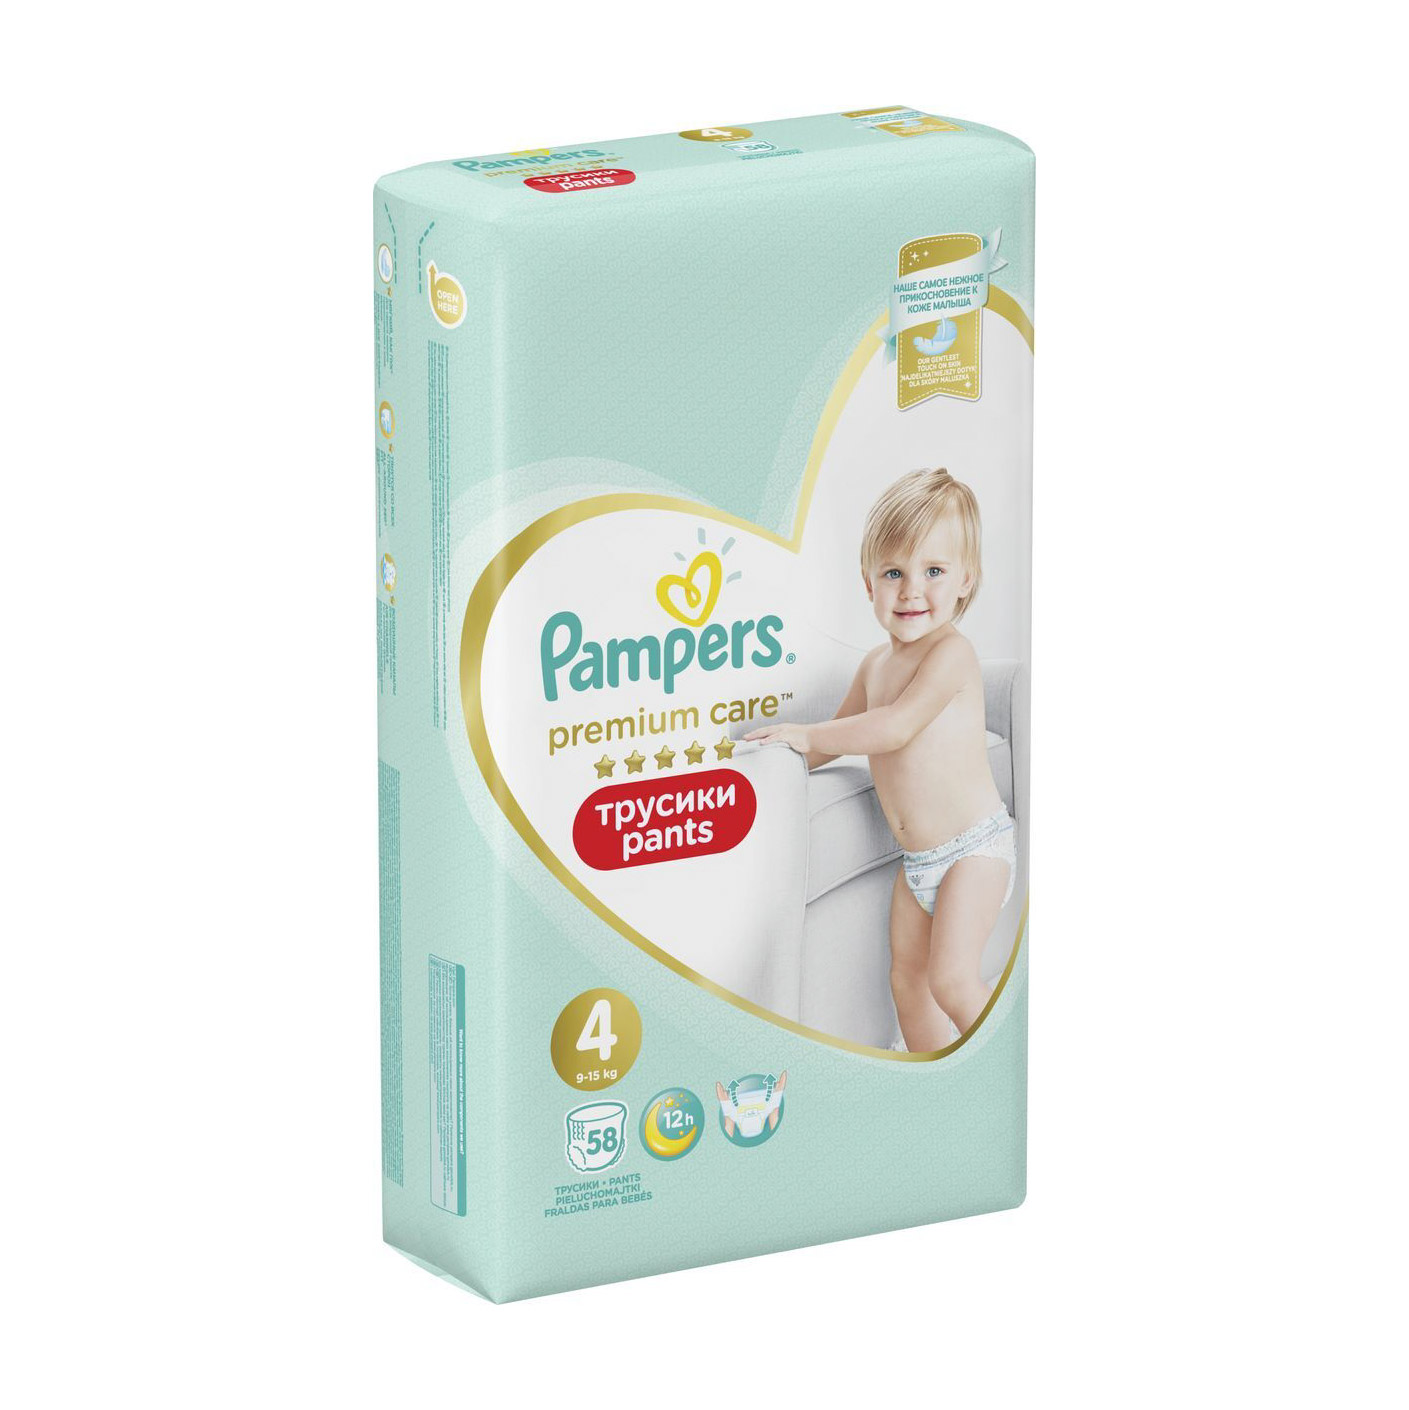 Подгузники-трусики Pampers Premium Care 9-15 кг 58 шт фото